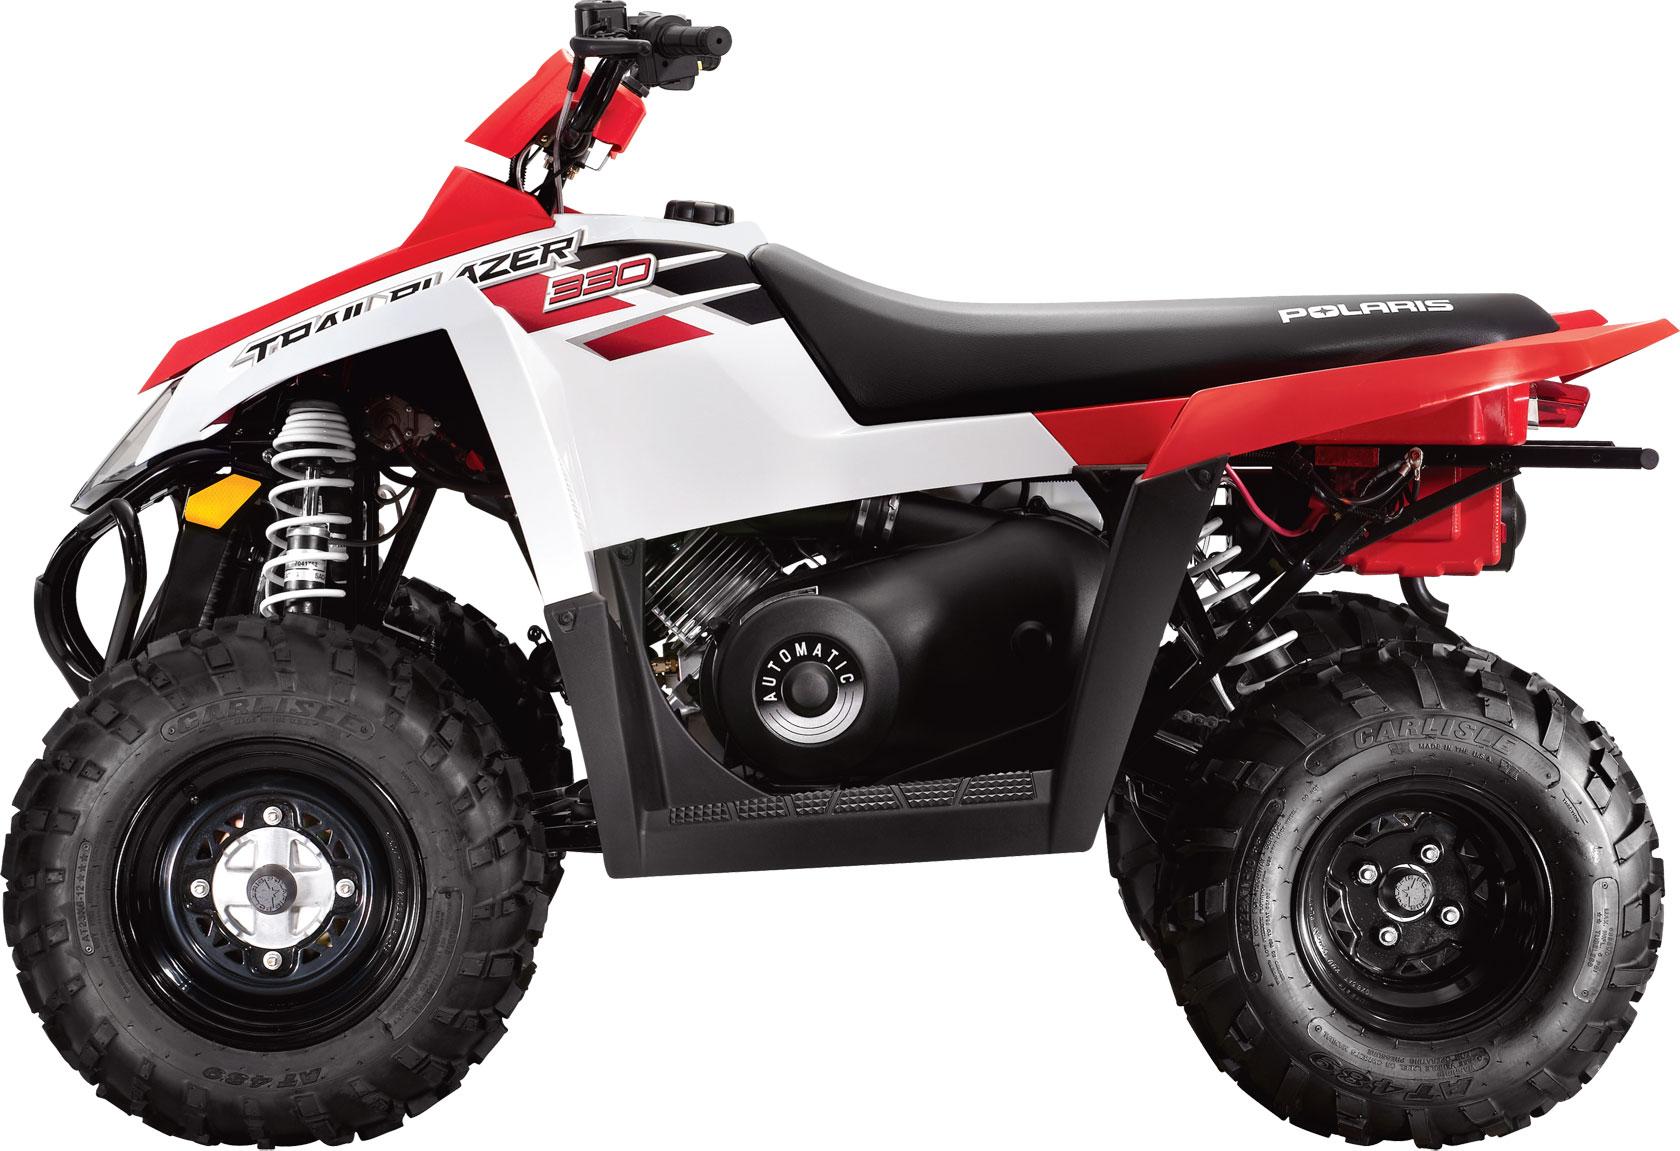 POLARIS Trail Blazer 330 - 2010, 2011 - autoevolution